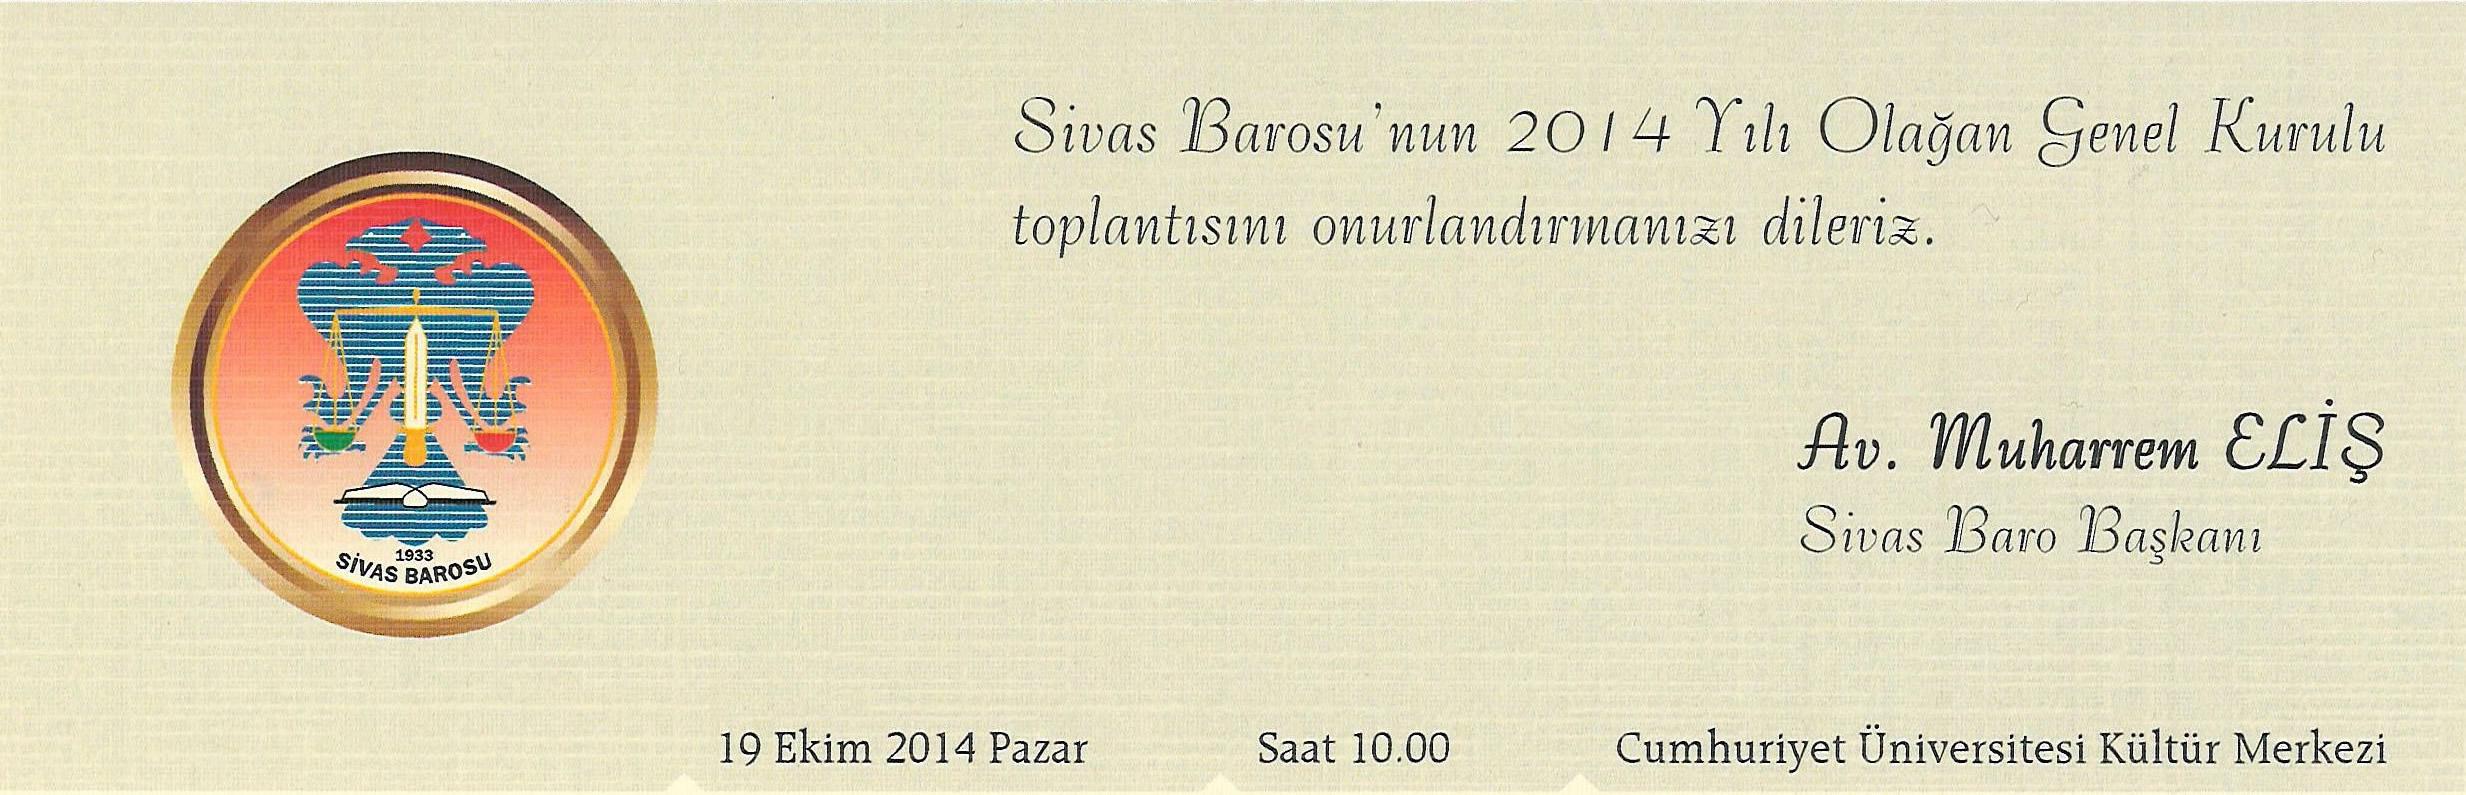 SİVAS BAROSU'NUN 2014 YILI OLAĞAN GENEL KURULU TOPLANTISI